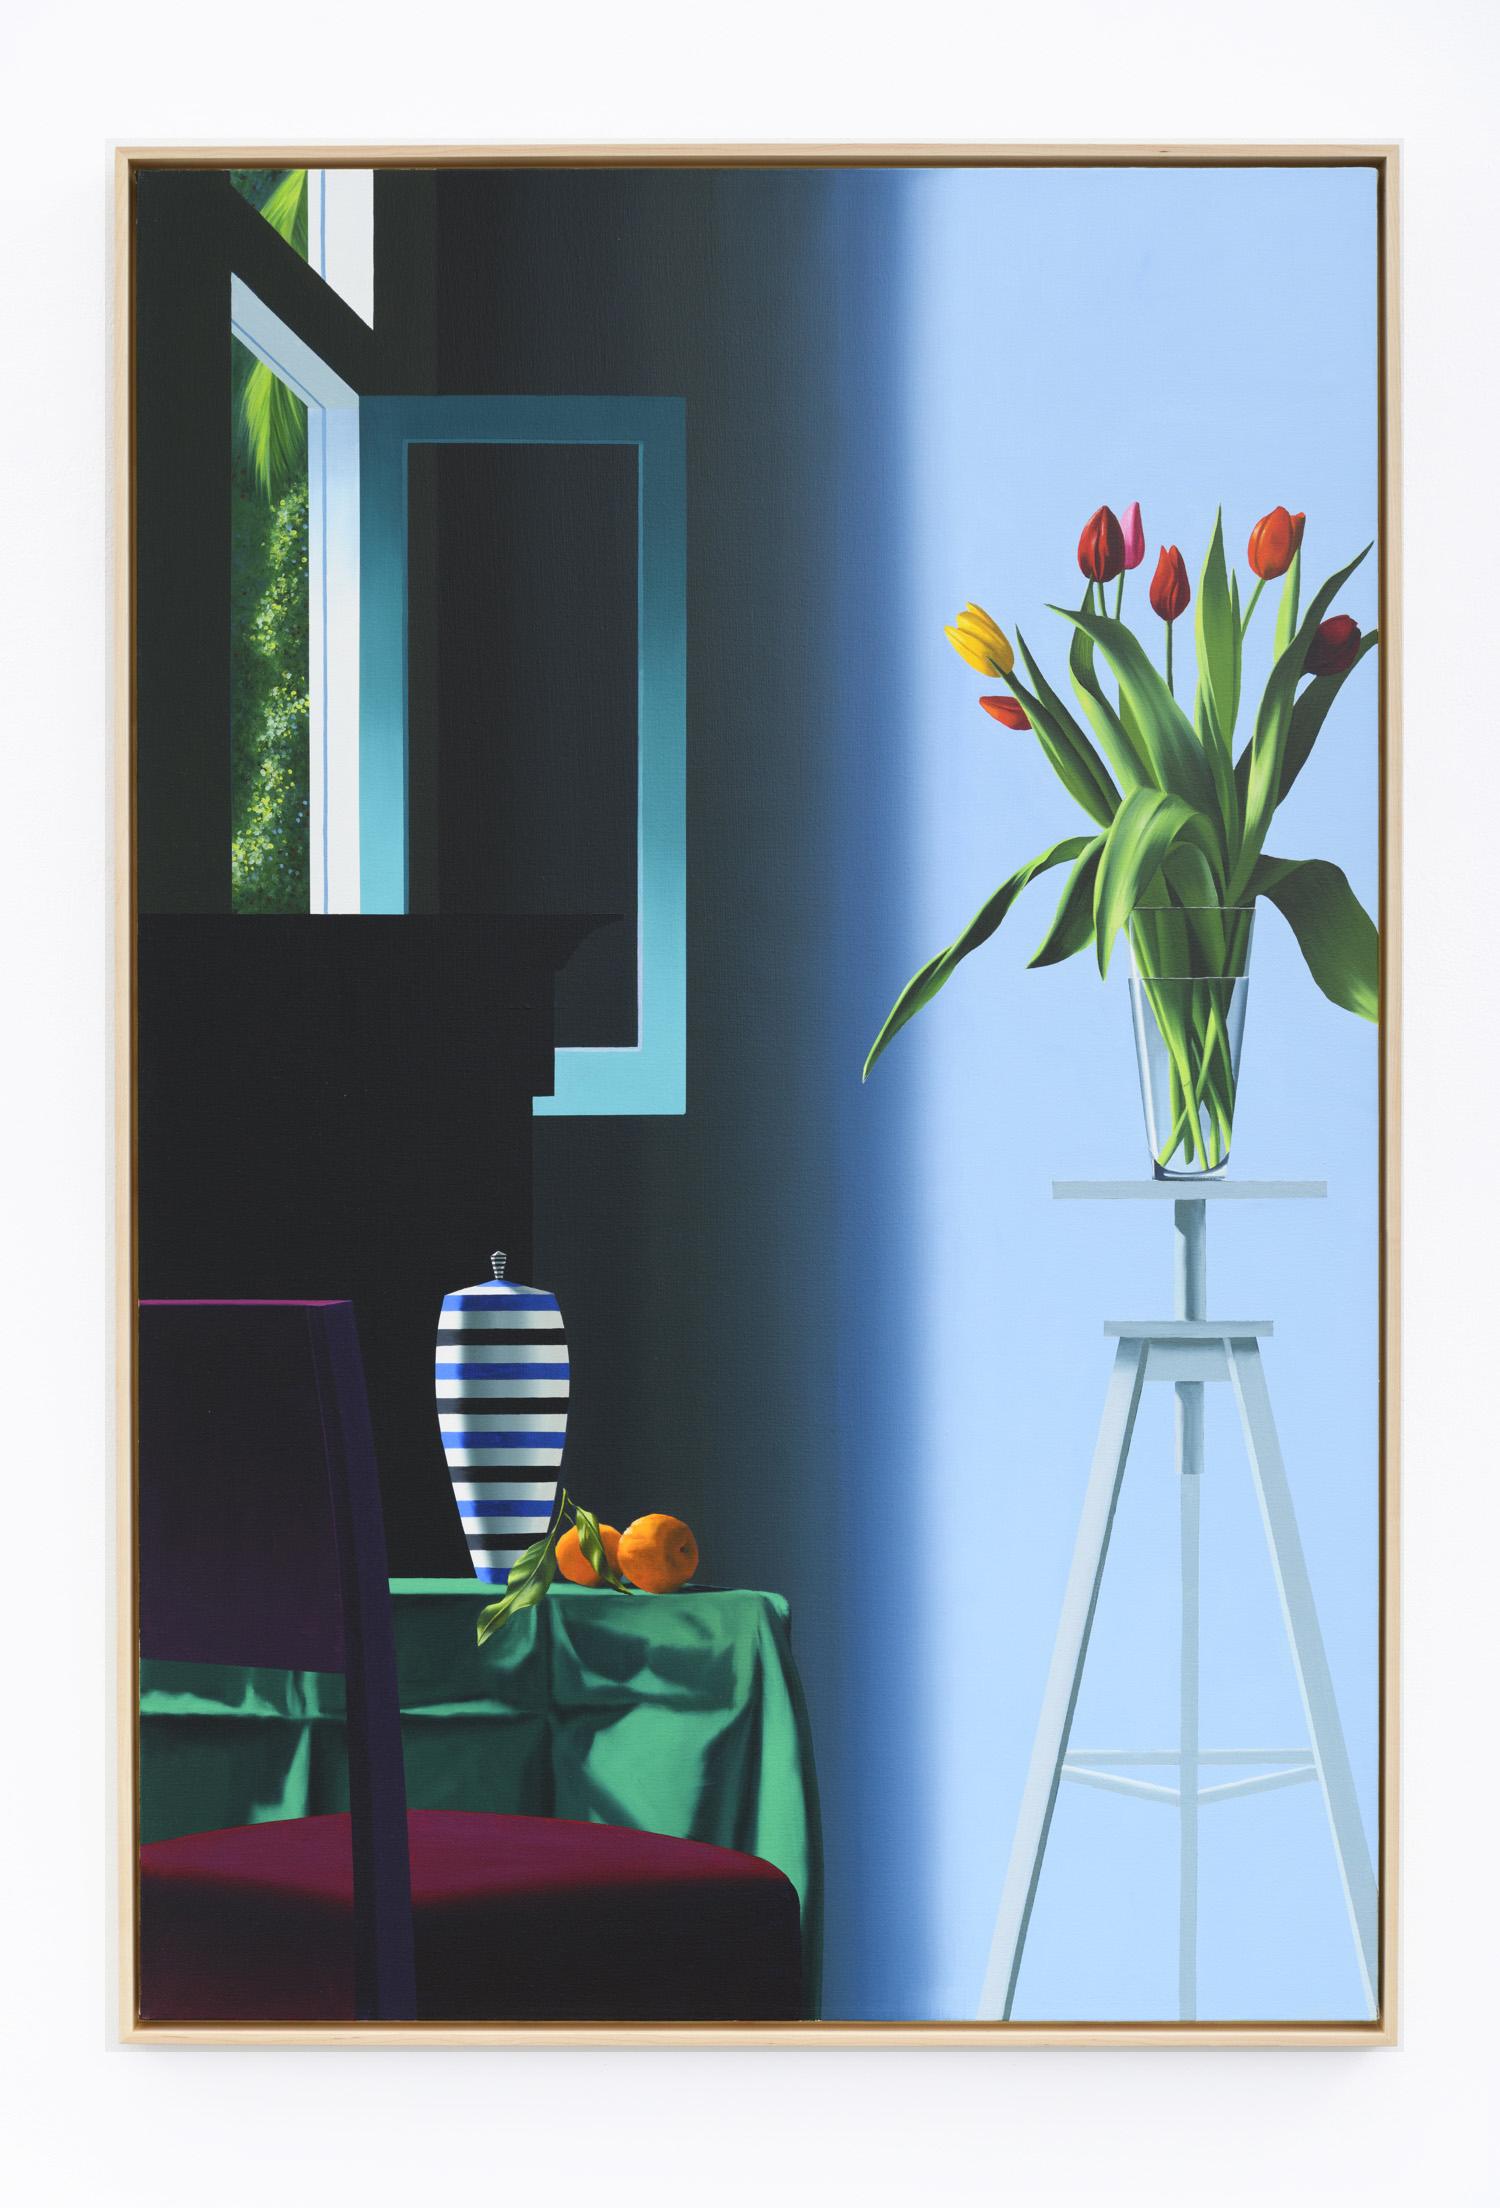 Flowers on Tripod by Bruce Cohen